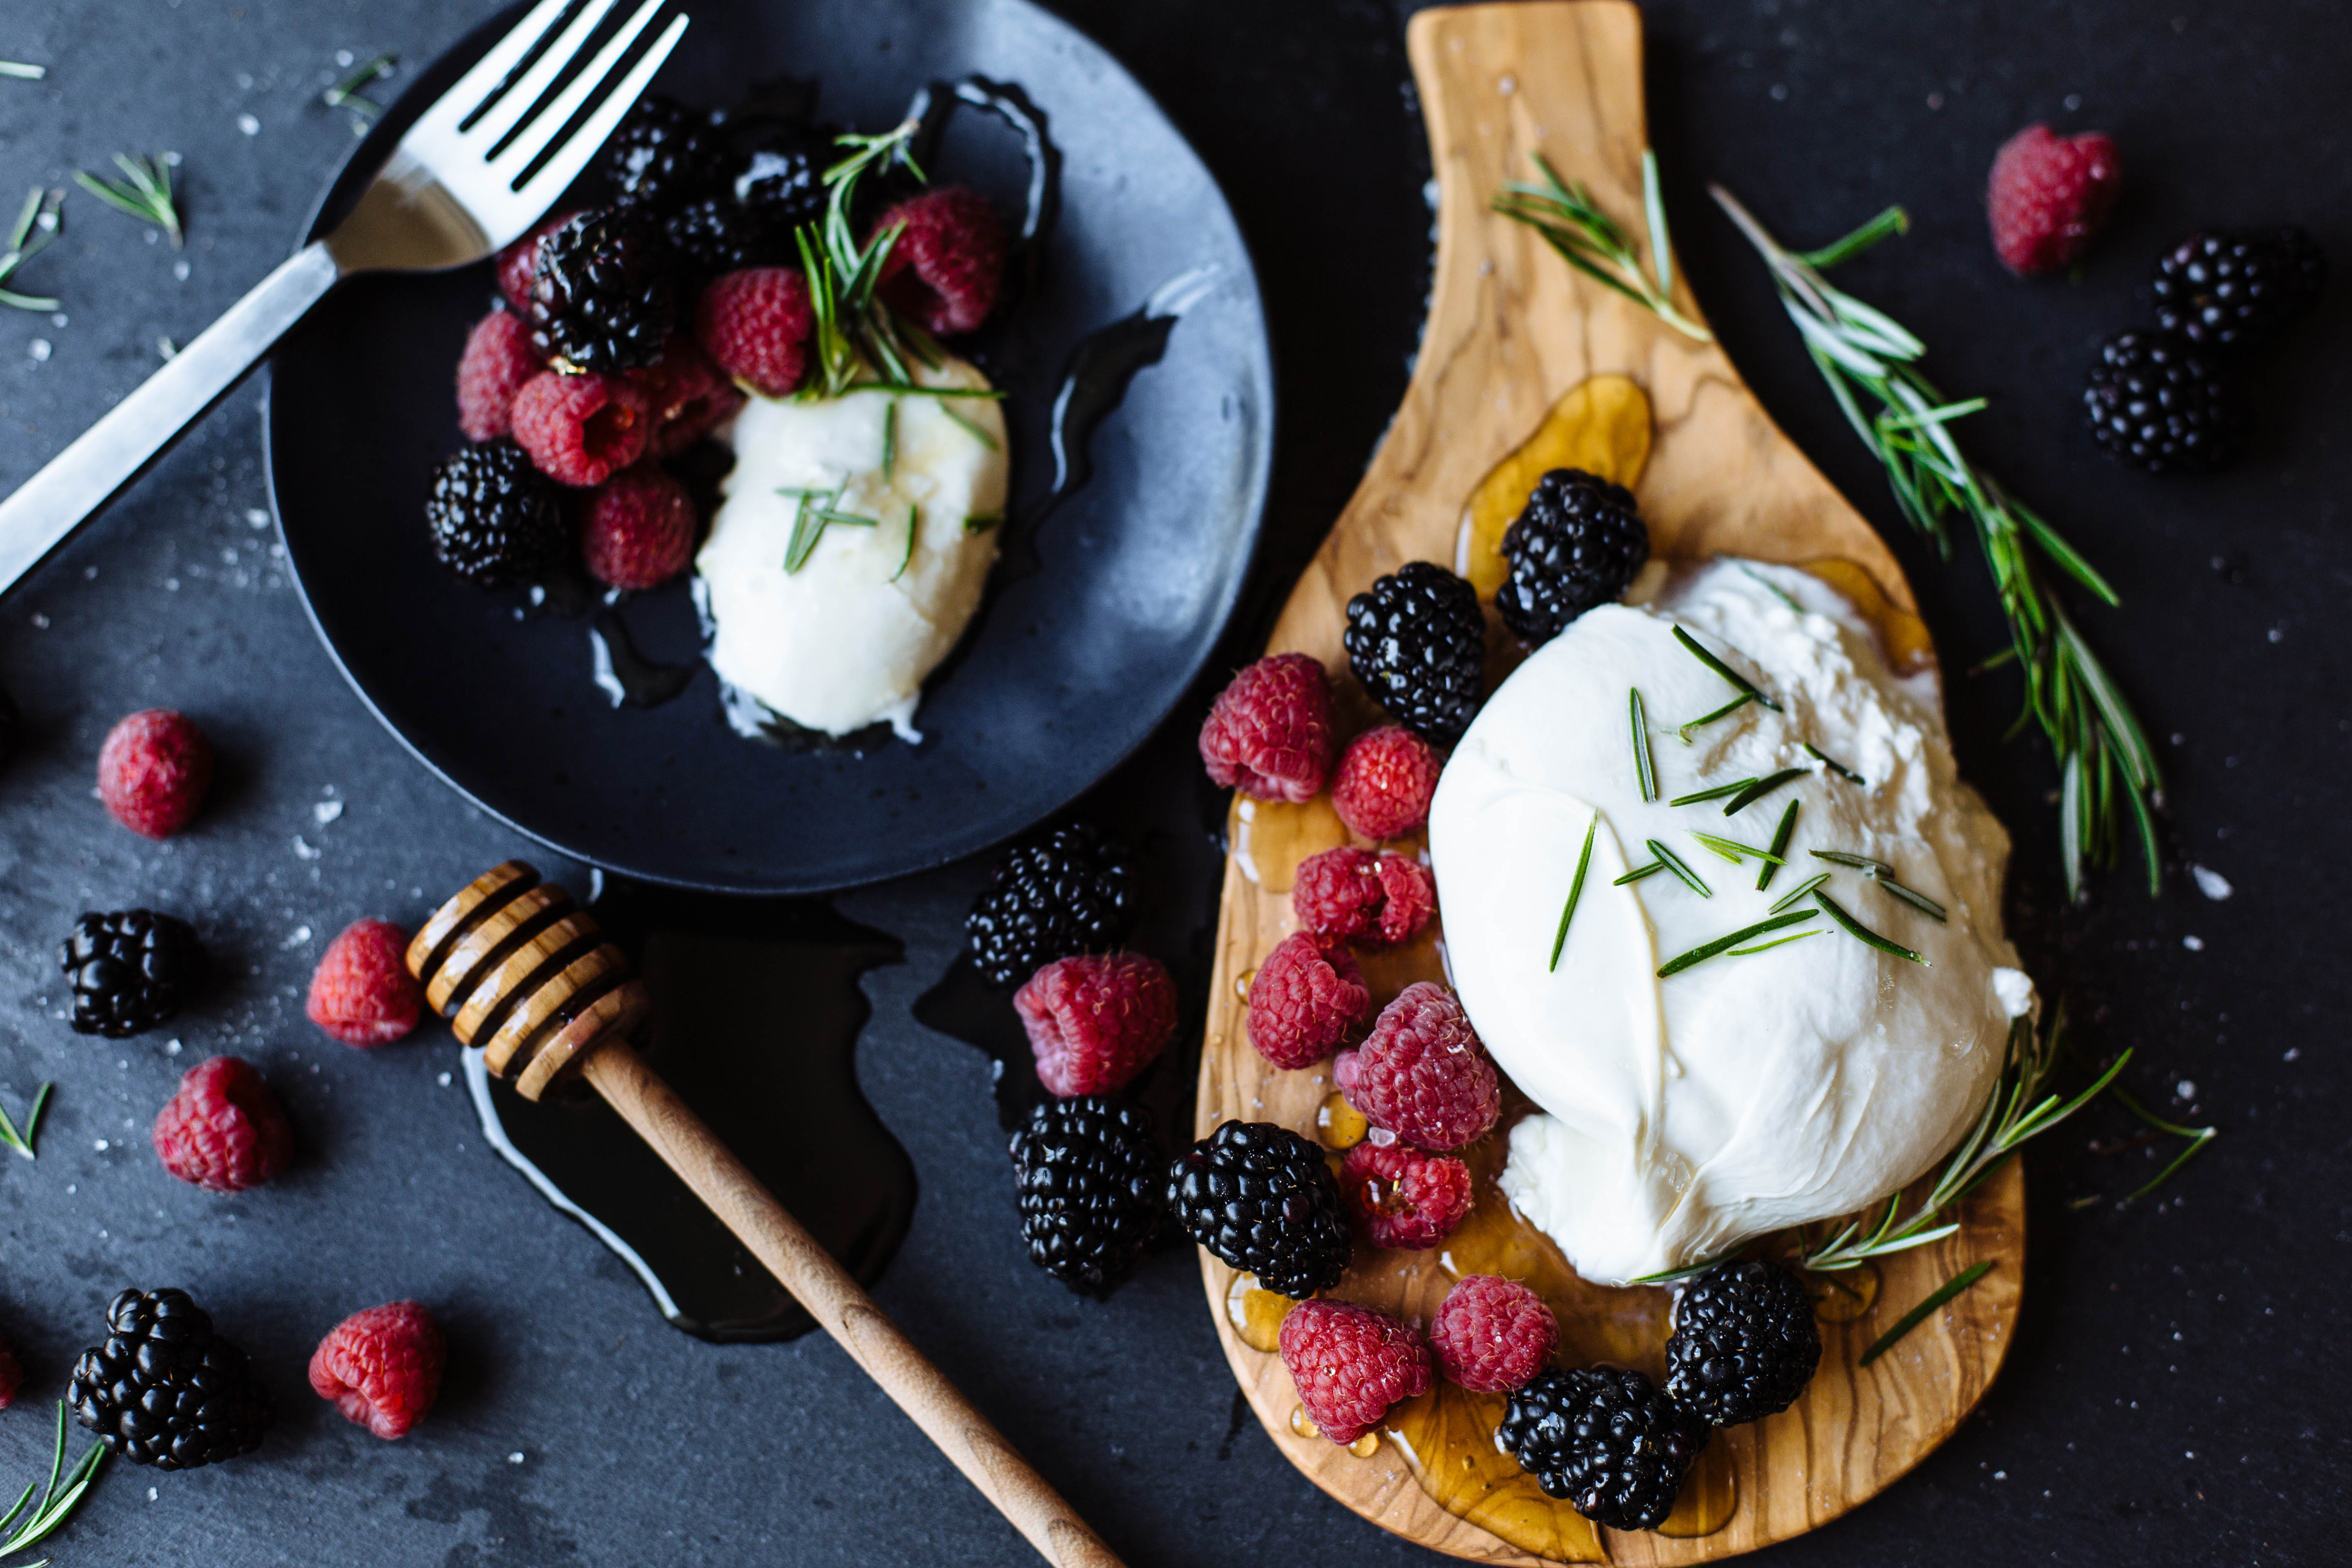 Burrata With Jalapeño Honey + Fresh Blackberries & Raspberries